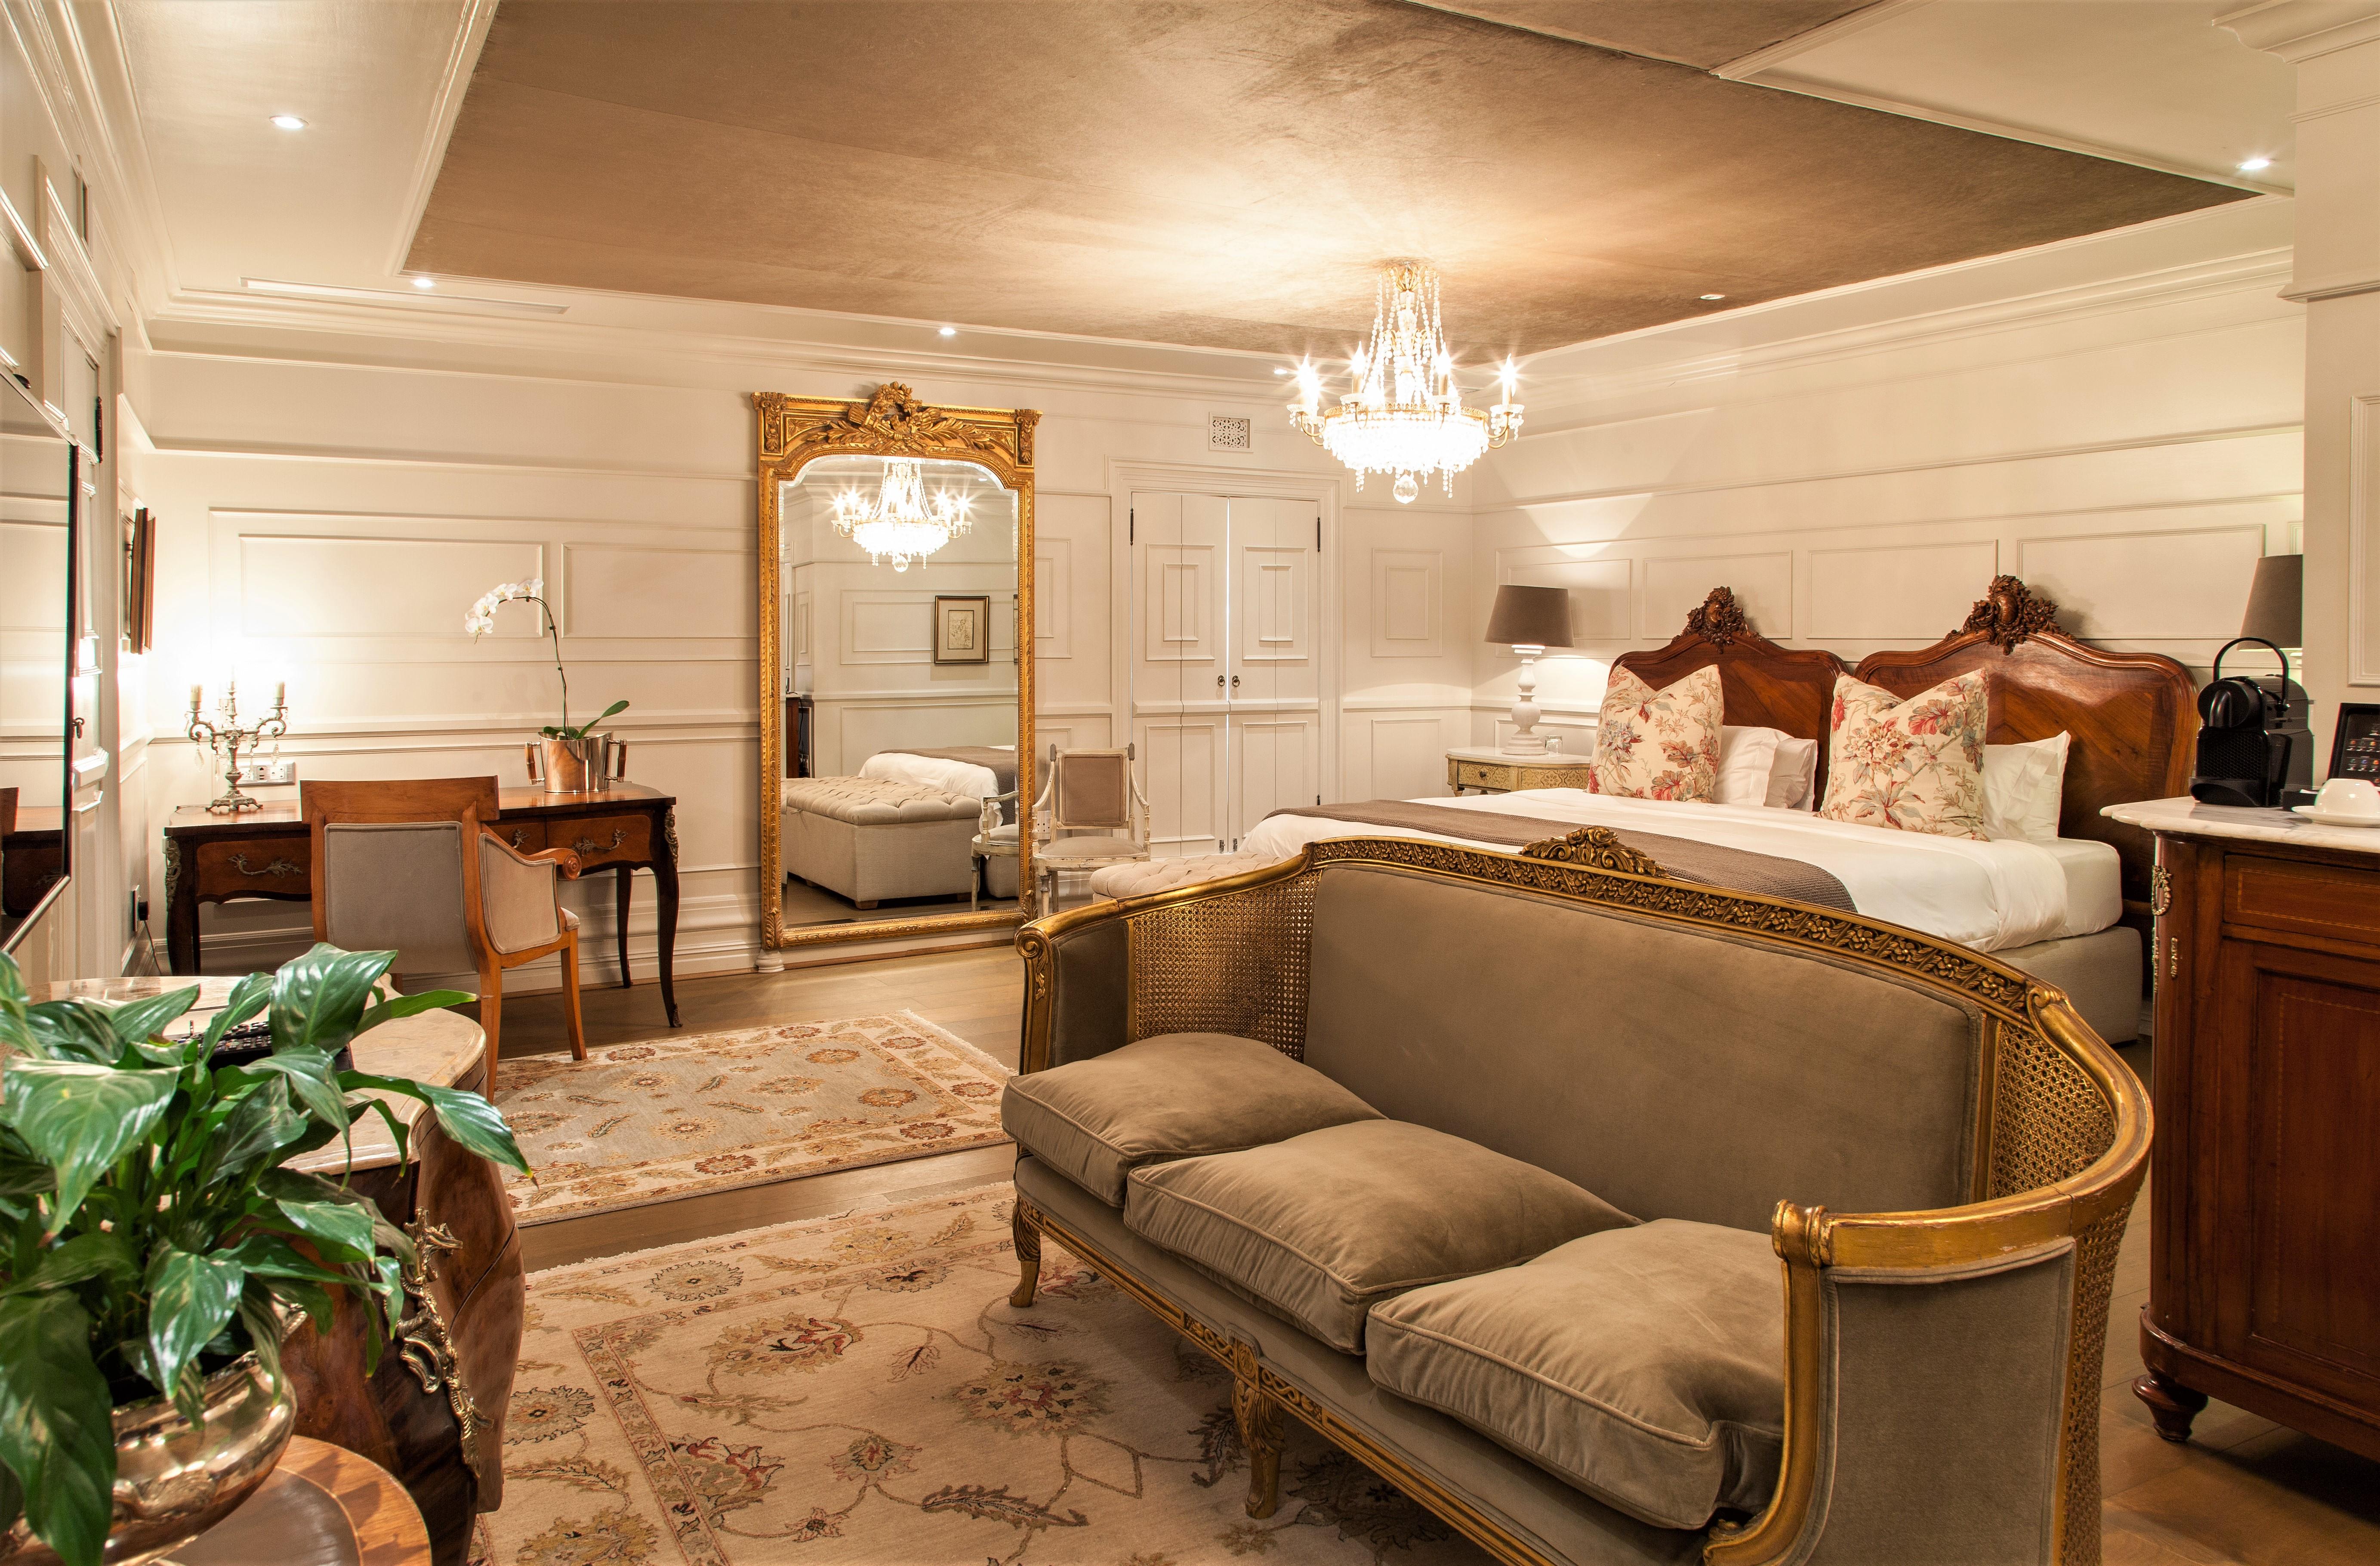 Lanzerac hotel bedrooms